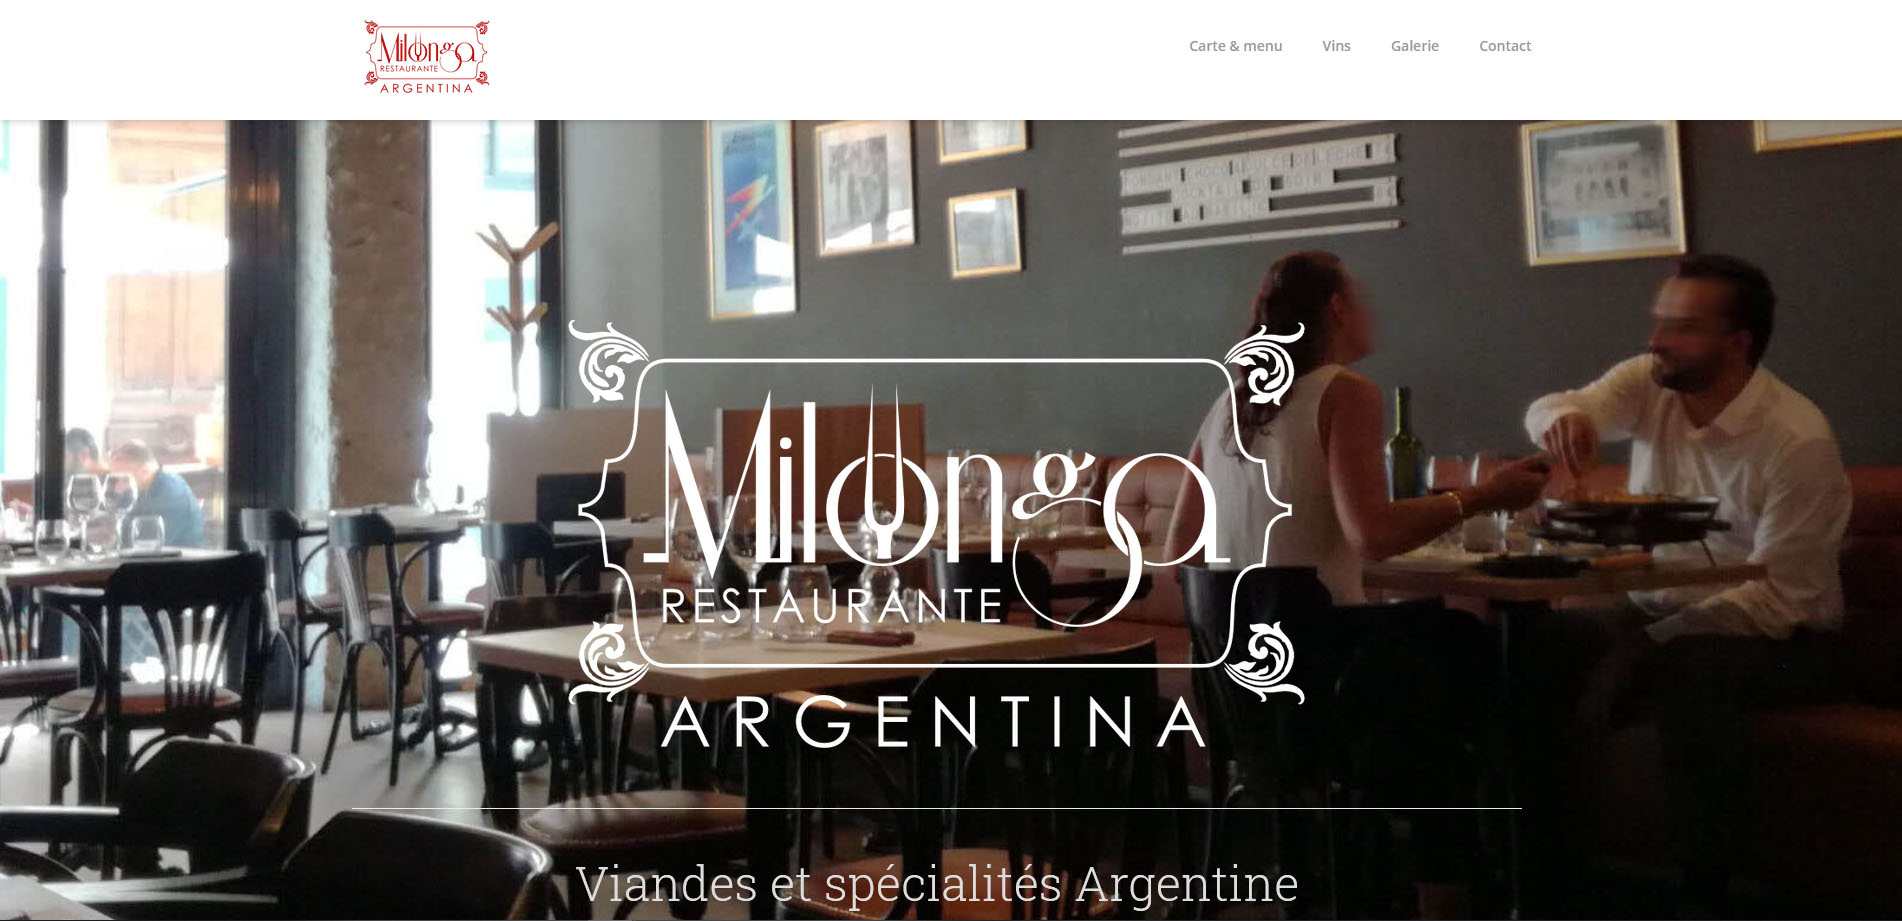 restaurant milonga lyon viande argentine amerique latine abys - webdesign - site internet